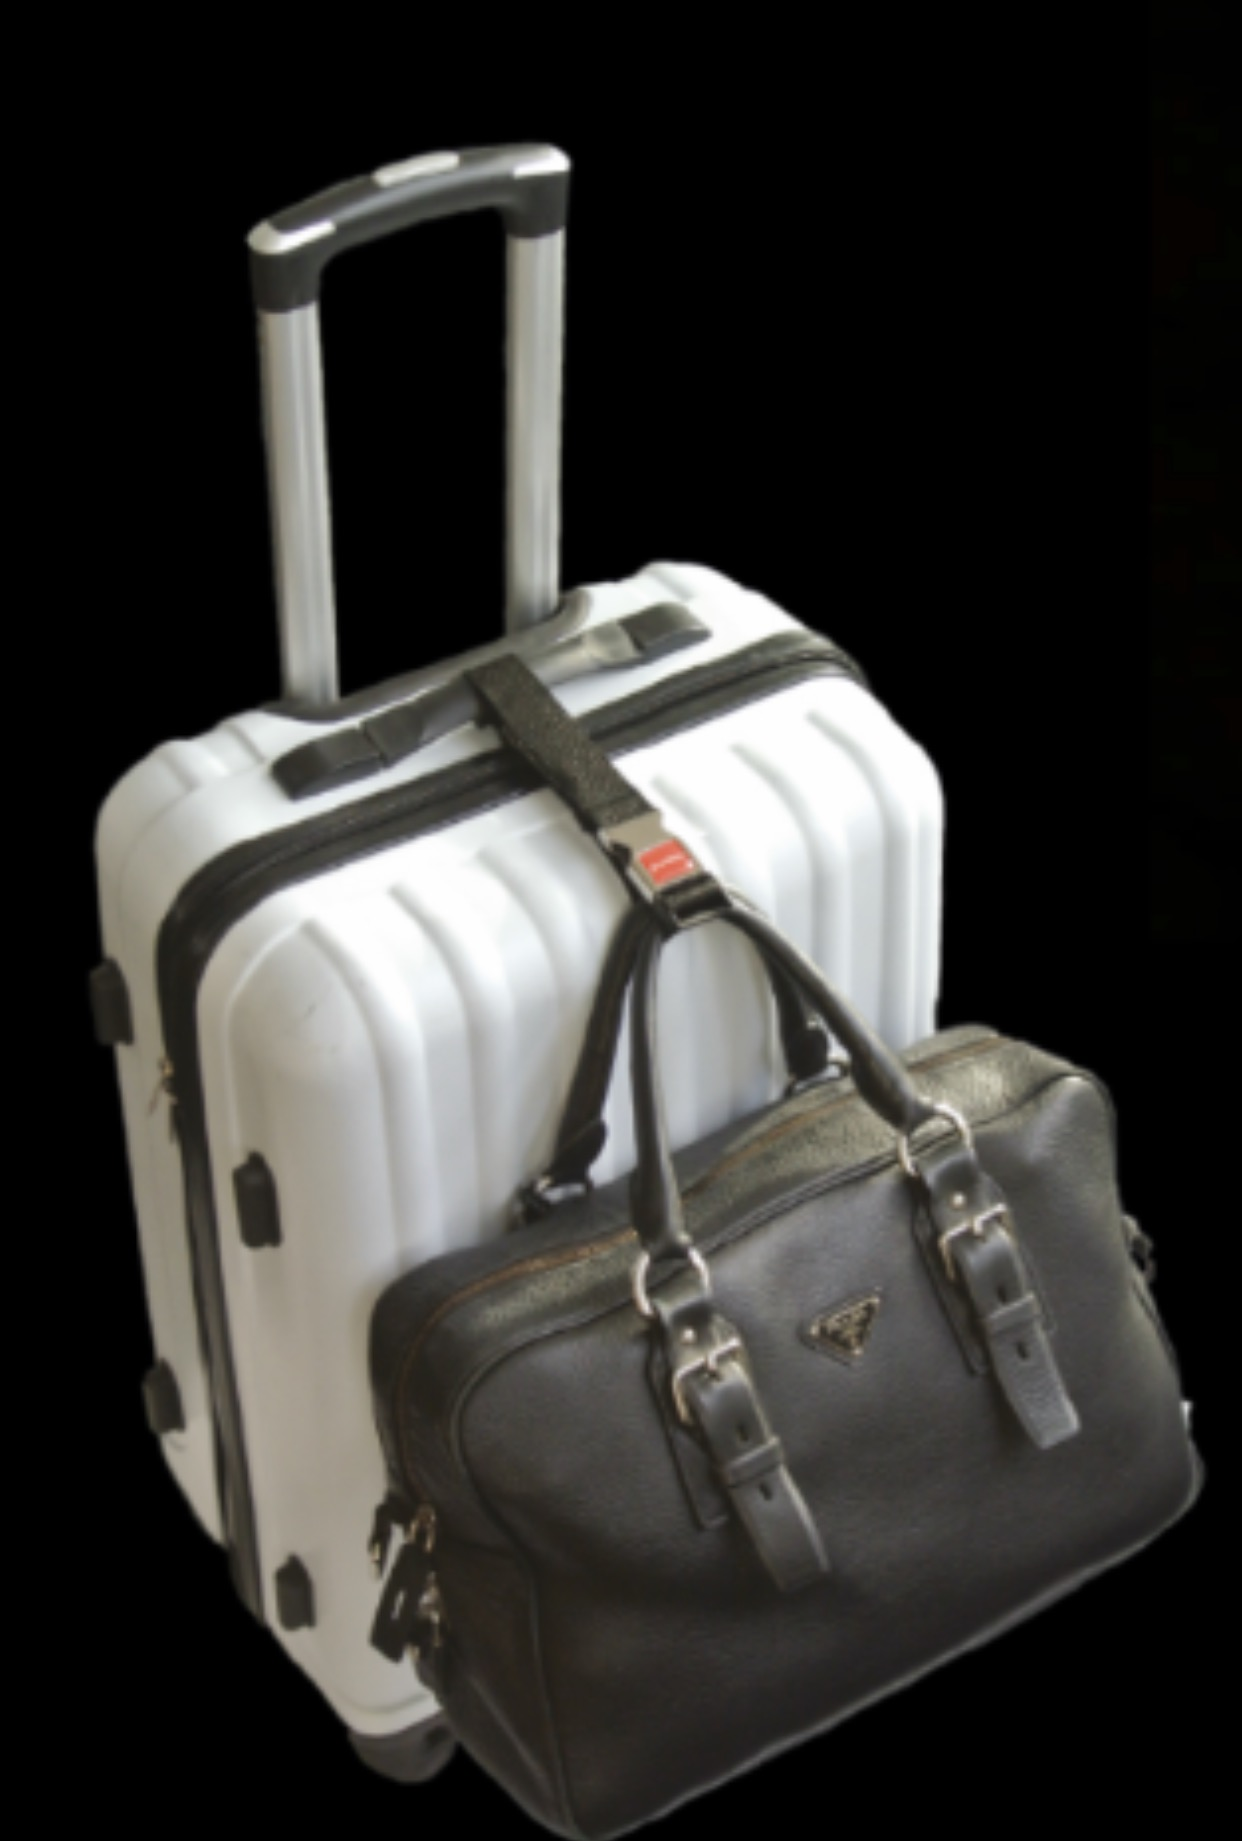 vakantie koffer en tas